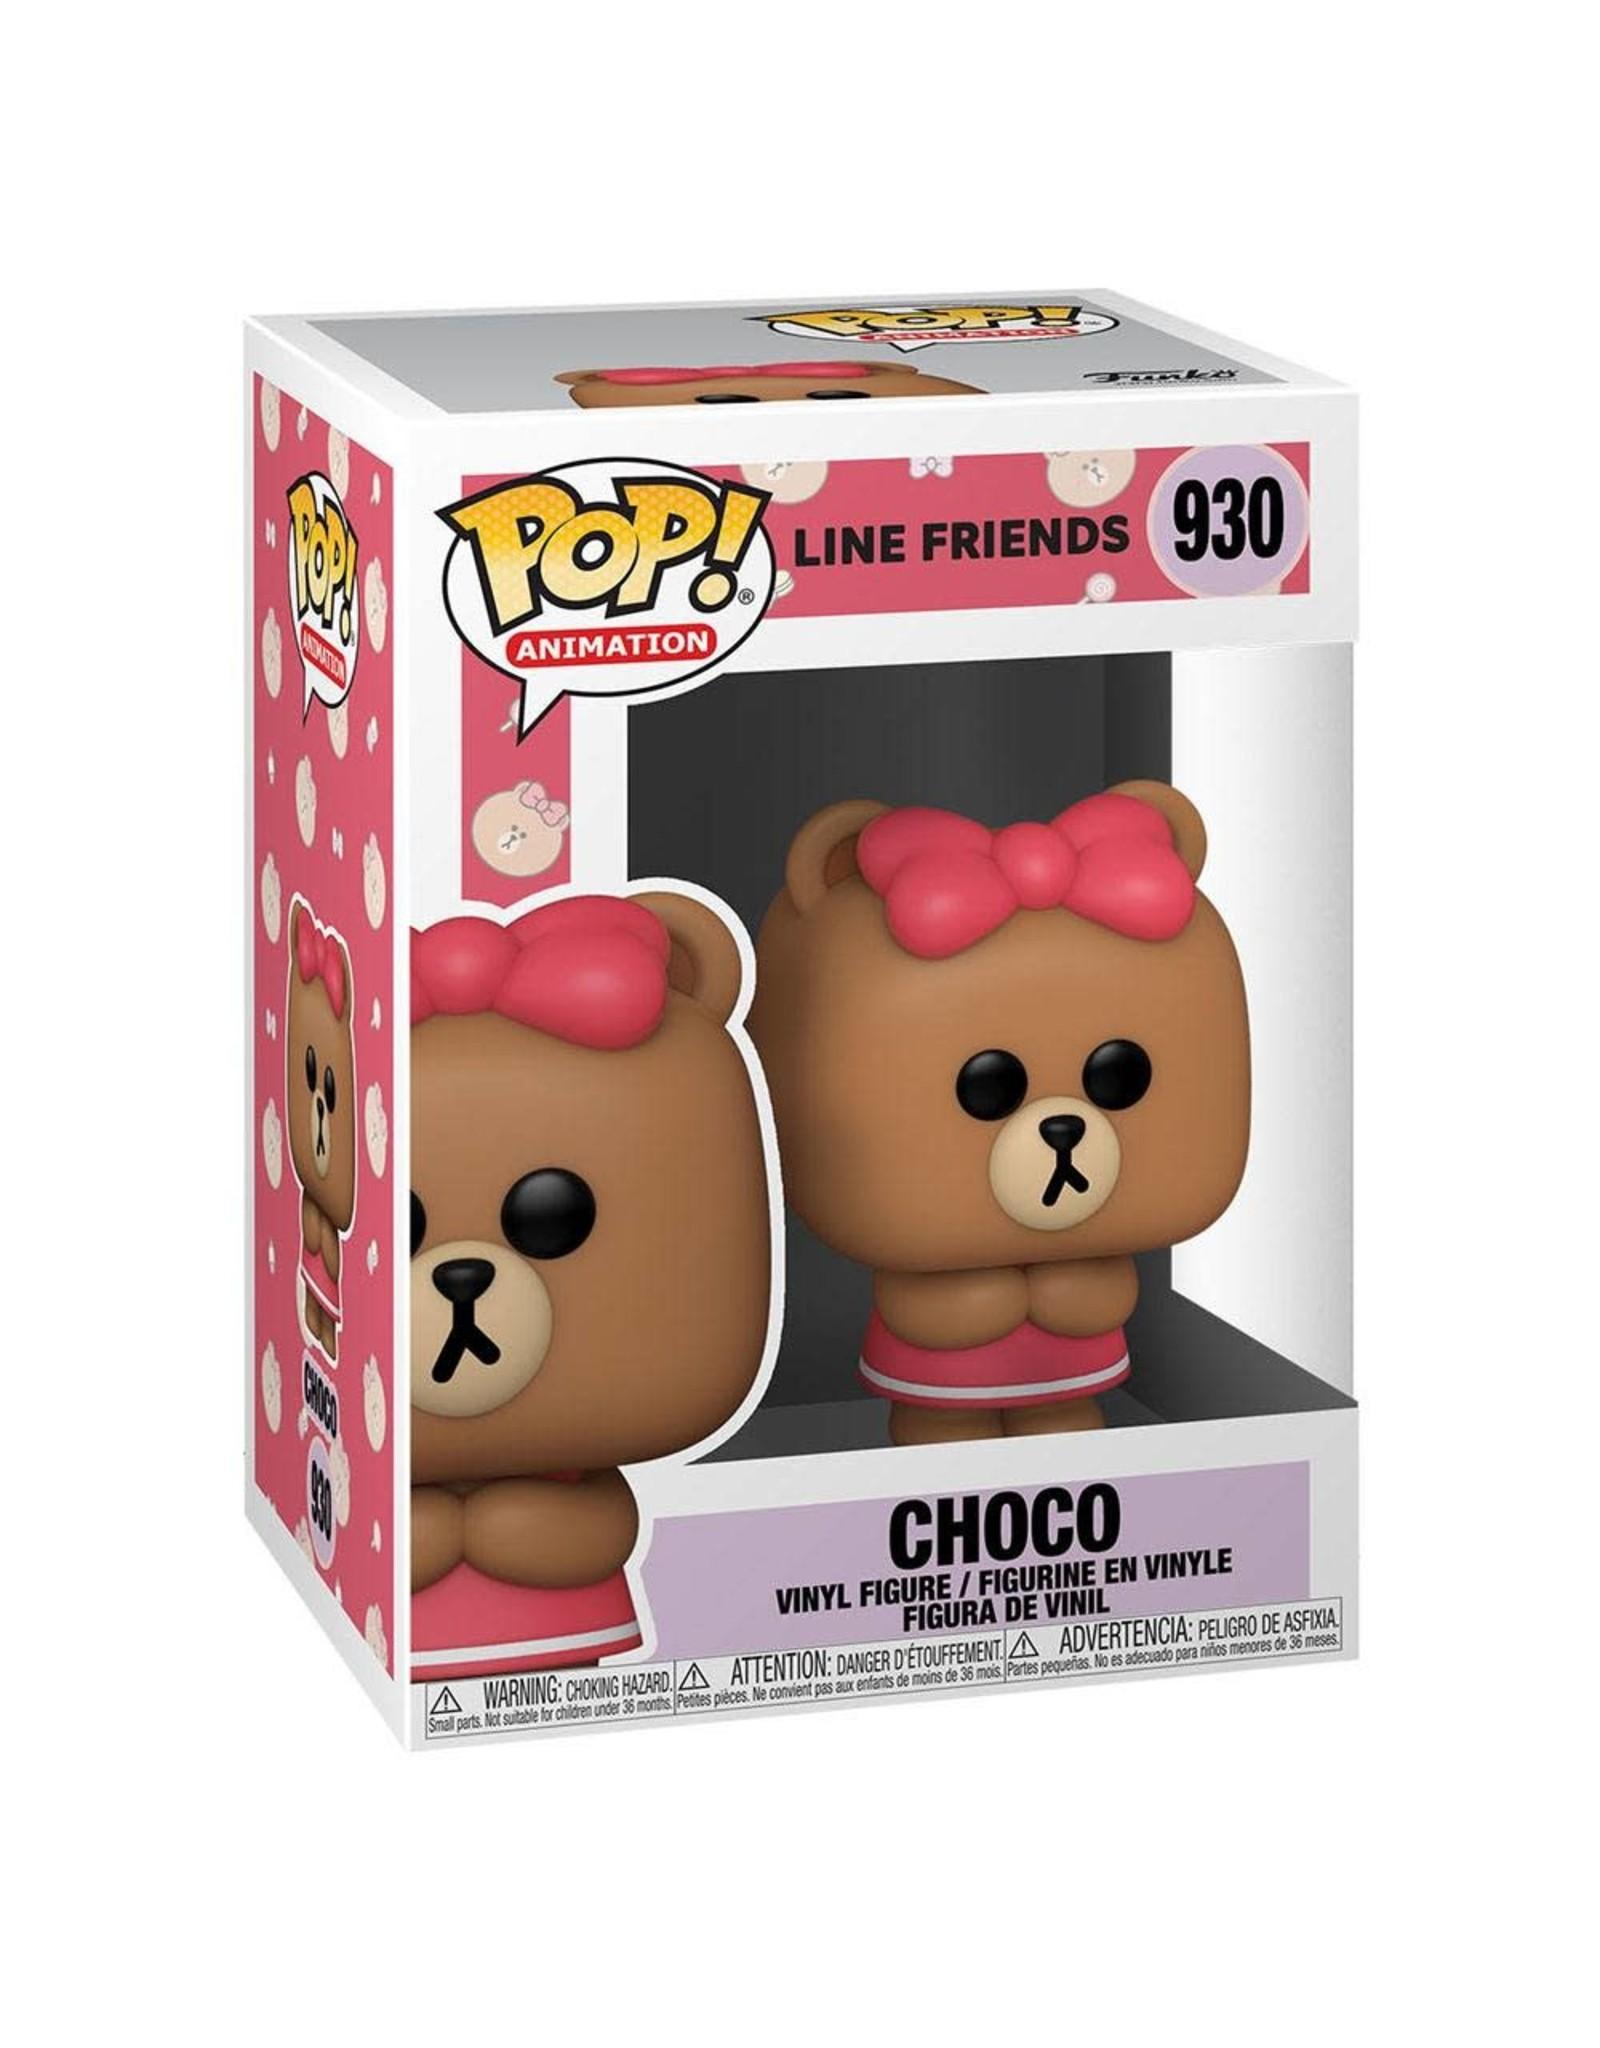 Line Friends - Funko Pop! Animation 930 - Choco